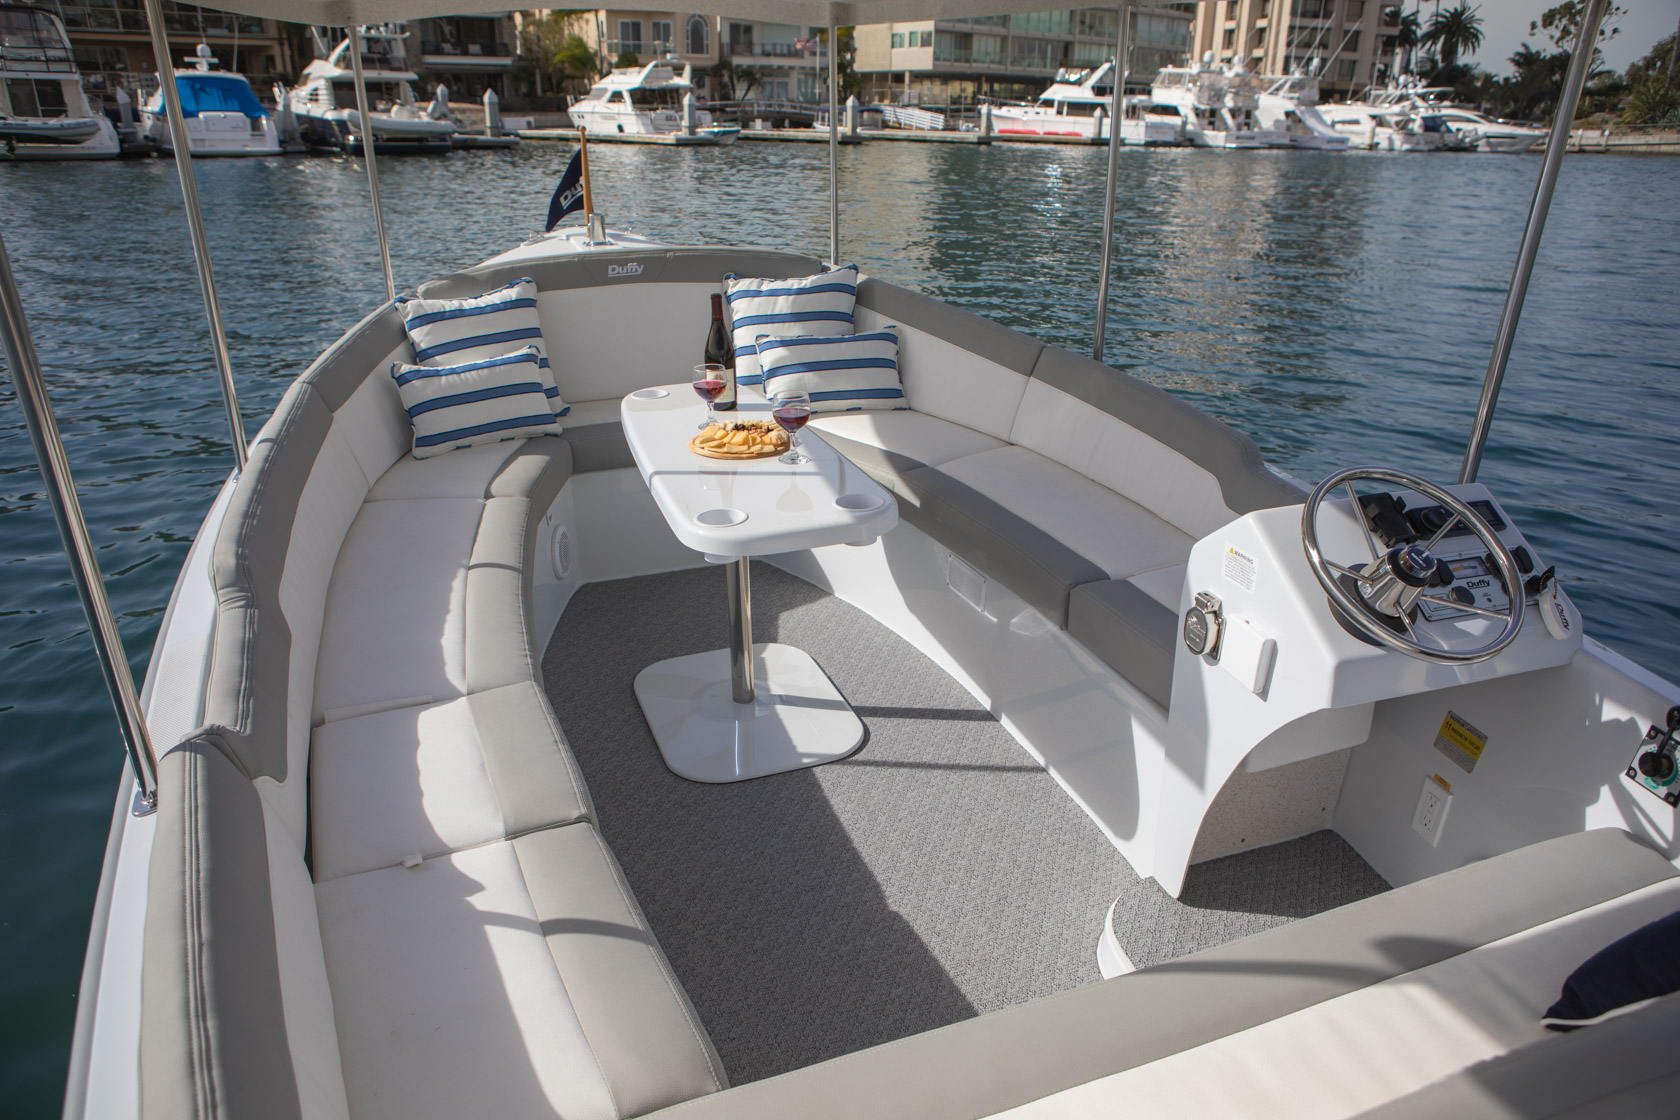 Duffy-Electric-Boats-Bayshore-18-Interior-v1-2